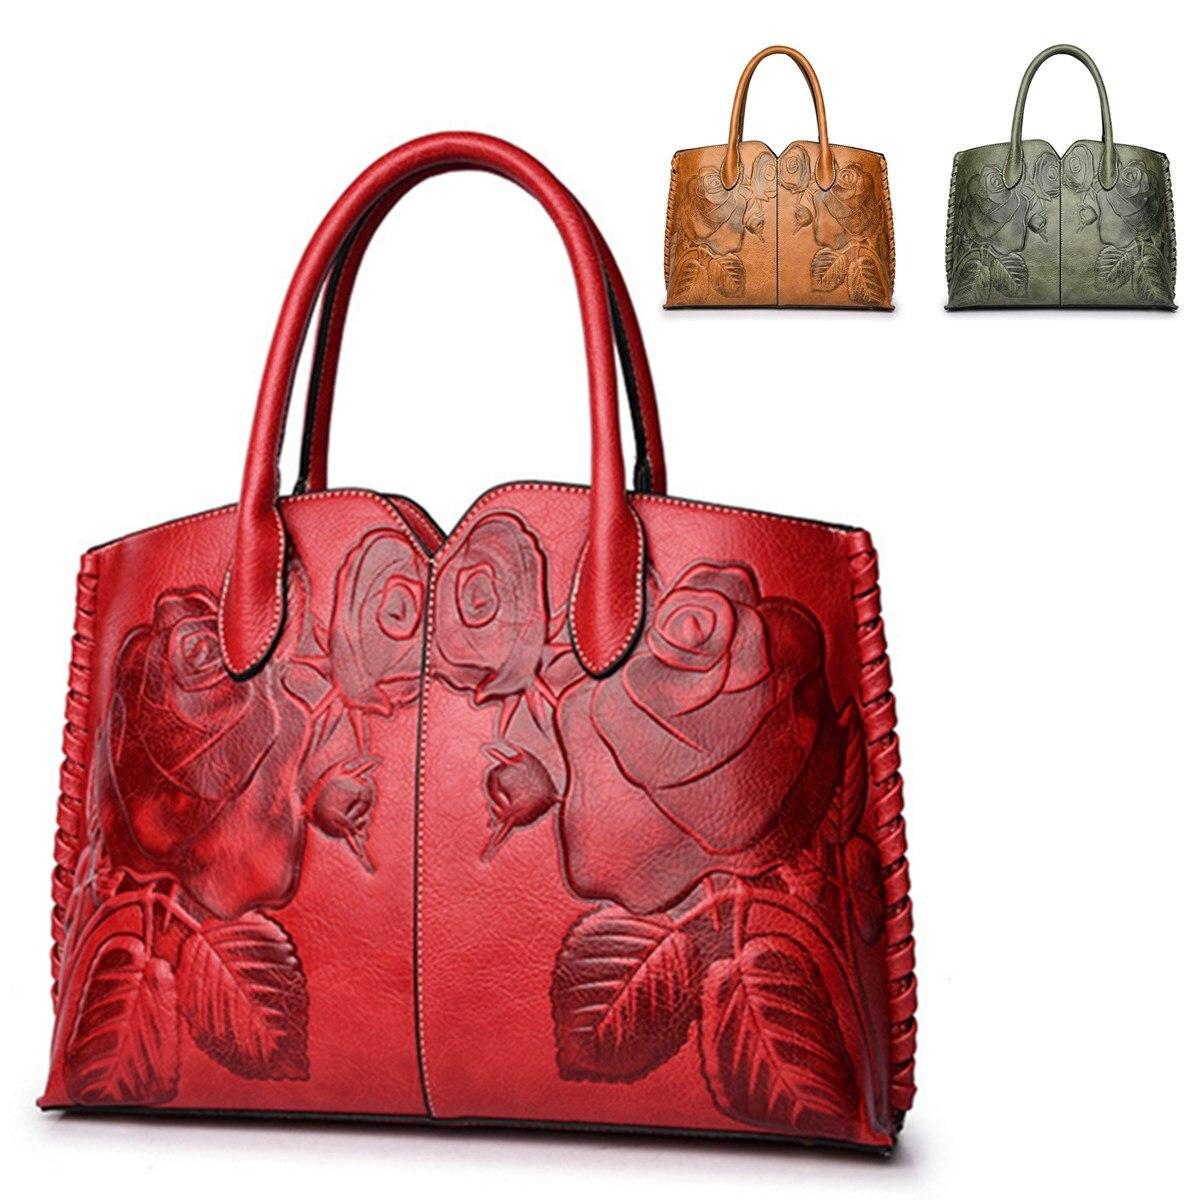 Retro PU Leather Women Handbag Embossed Peony Chinese Style Large Capacity Crossbody Bag Shoulder Messenger Bag Bolsa Feminina